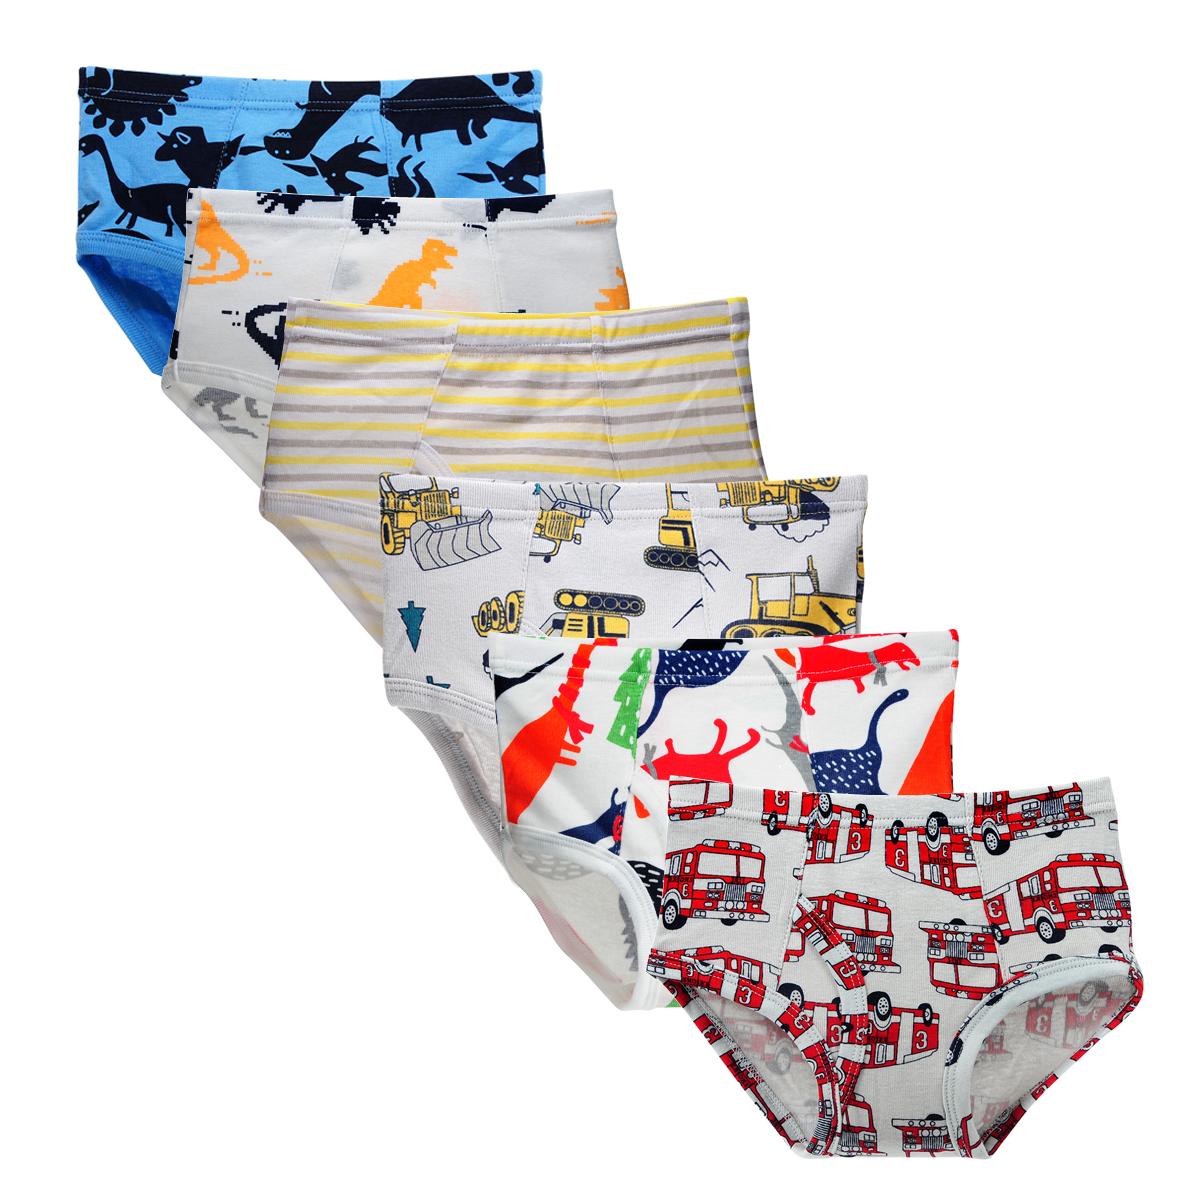 Closecret Kids Series Soft Cotton Underwear Little Boys Assorted Briefs Pack of 6